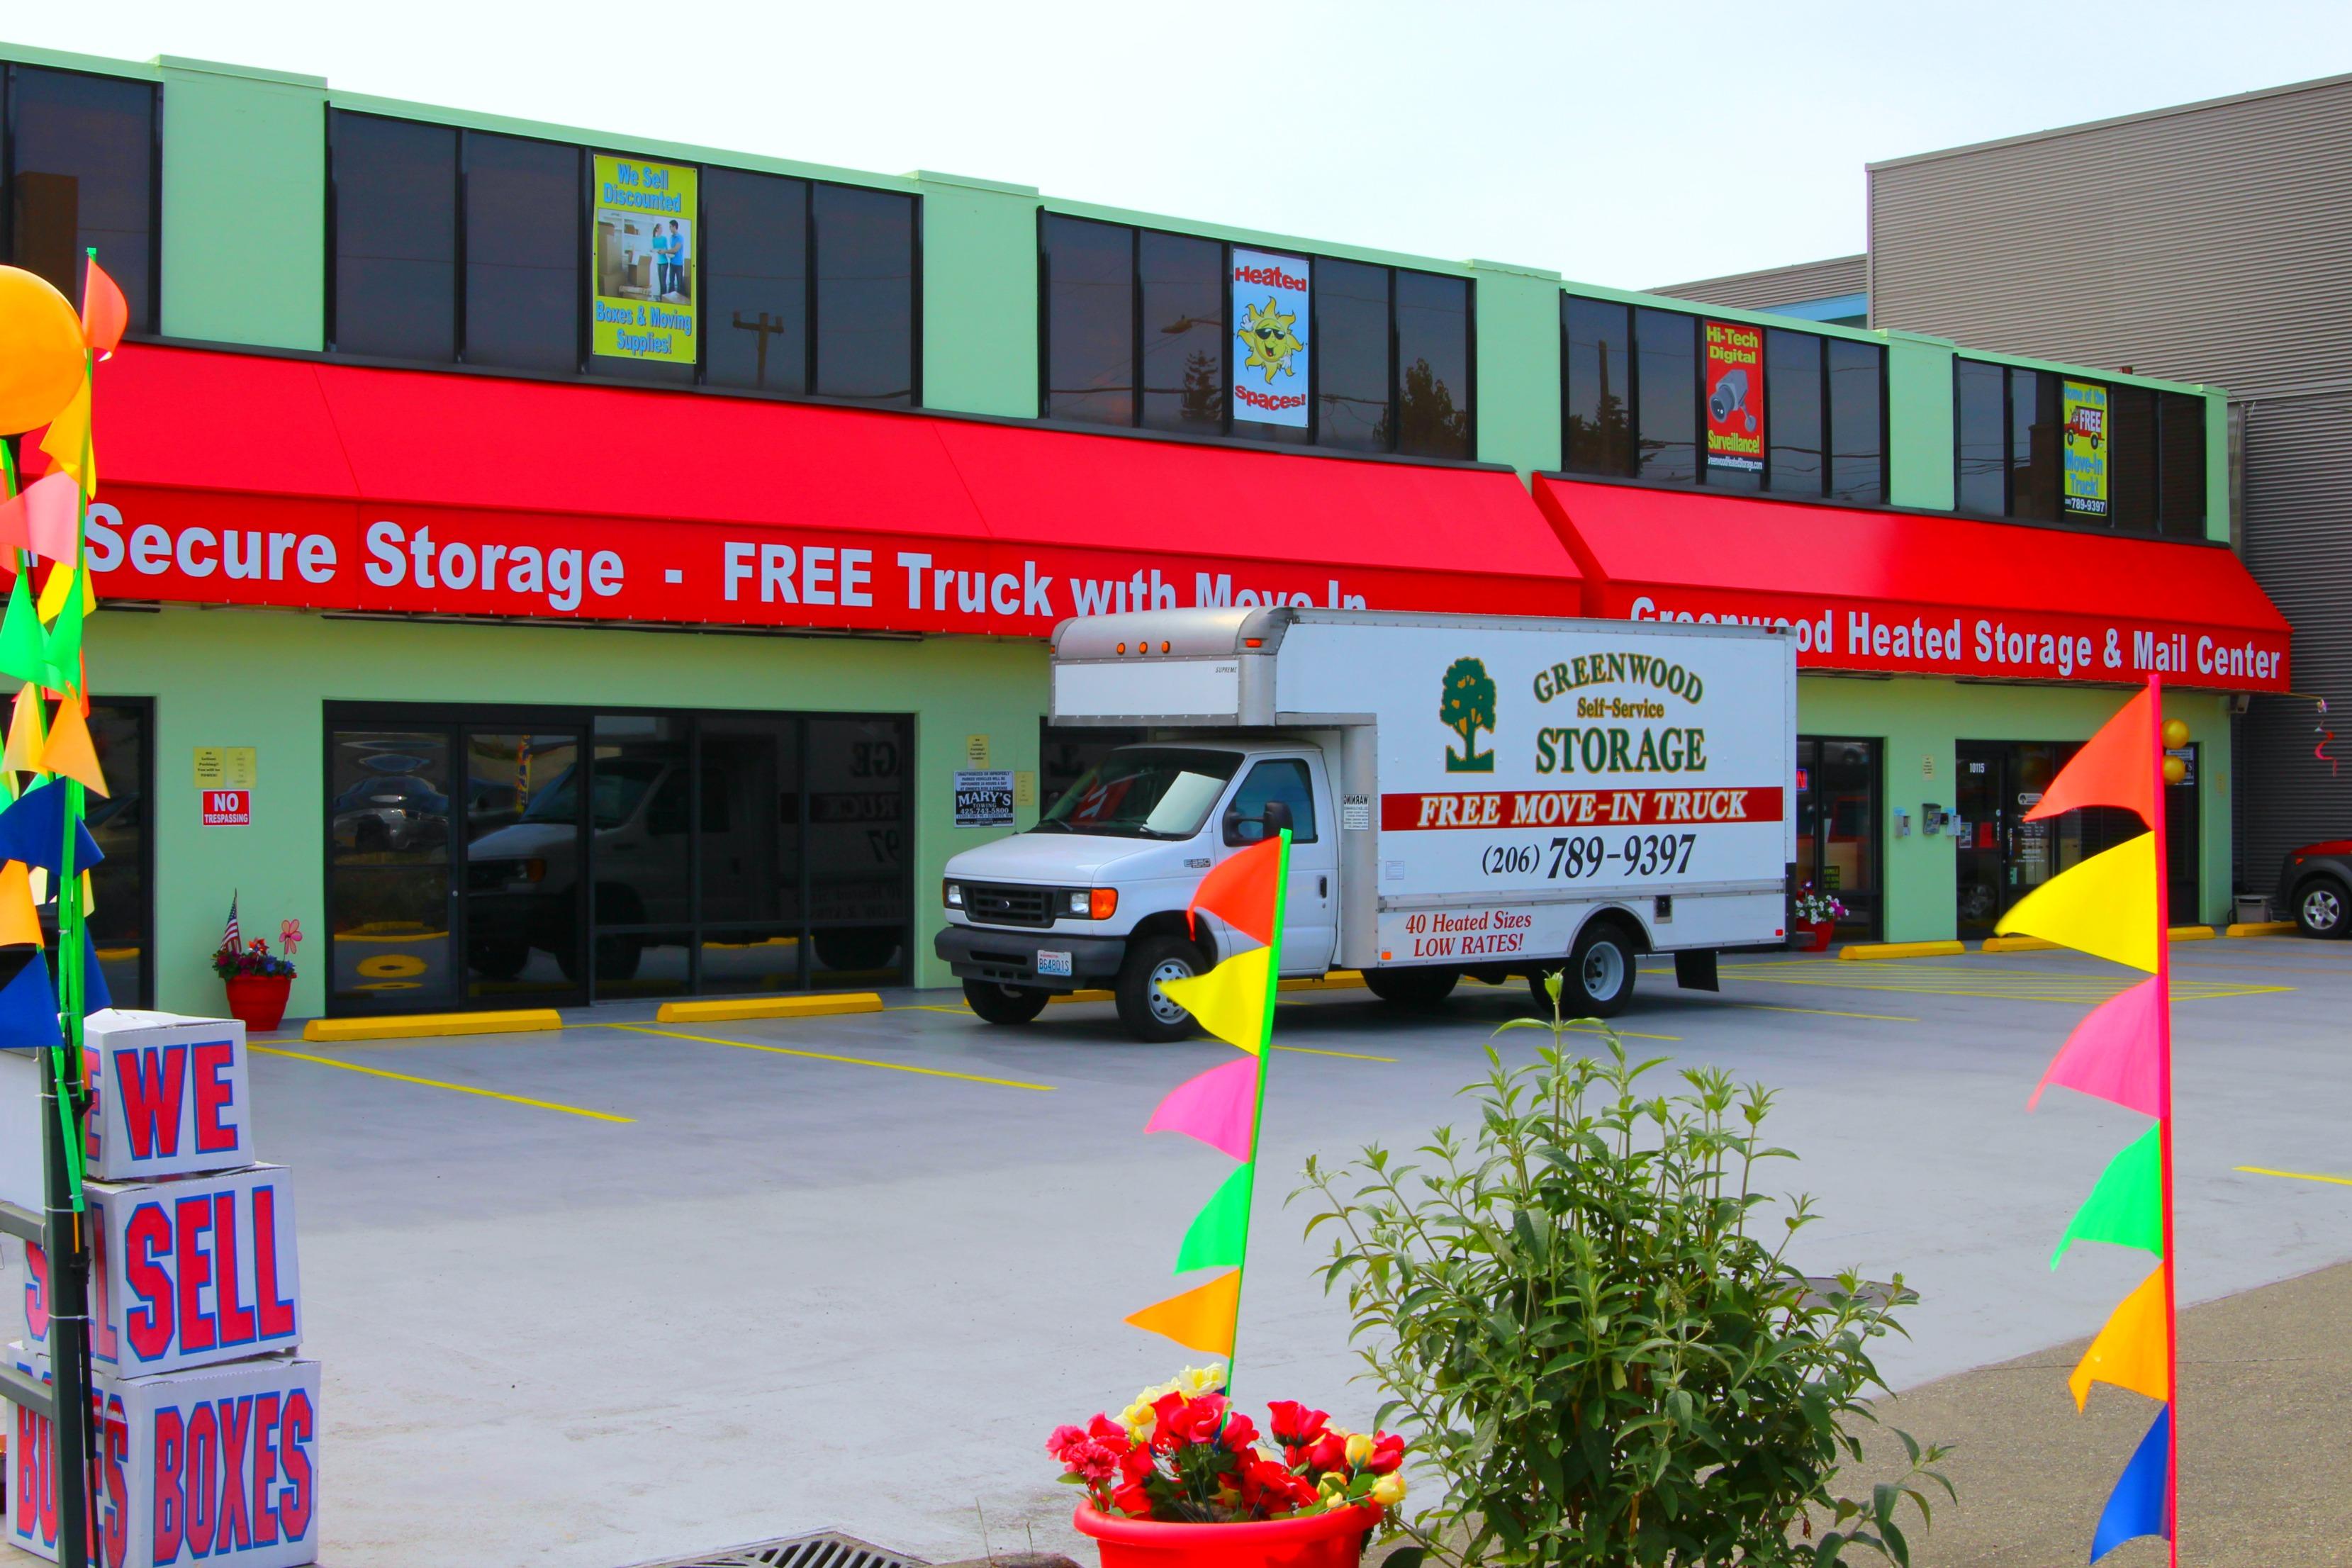 Superbe Greenwood Self Service Storage 10115 Greenwood Ave N Ste 100, Seattle, WA  98133   YP.com